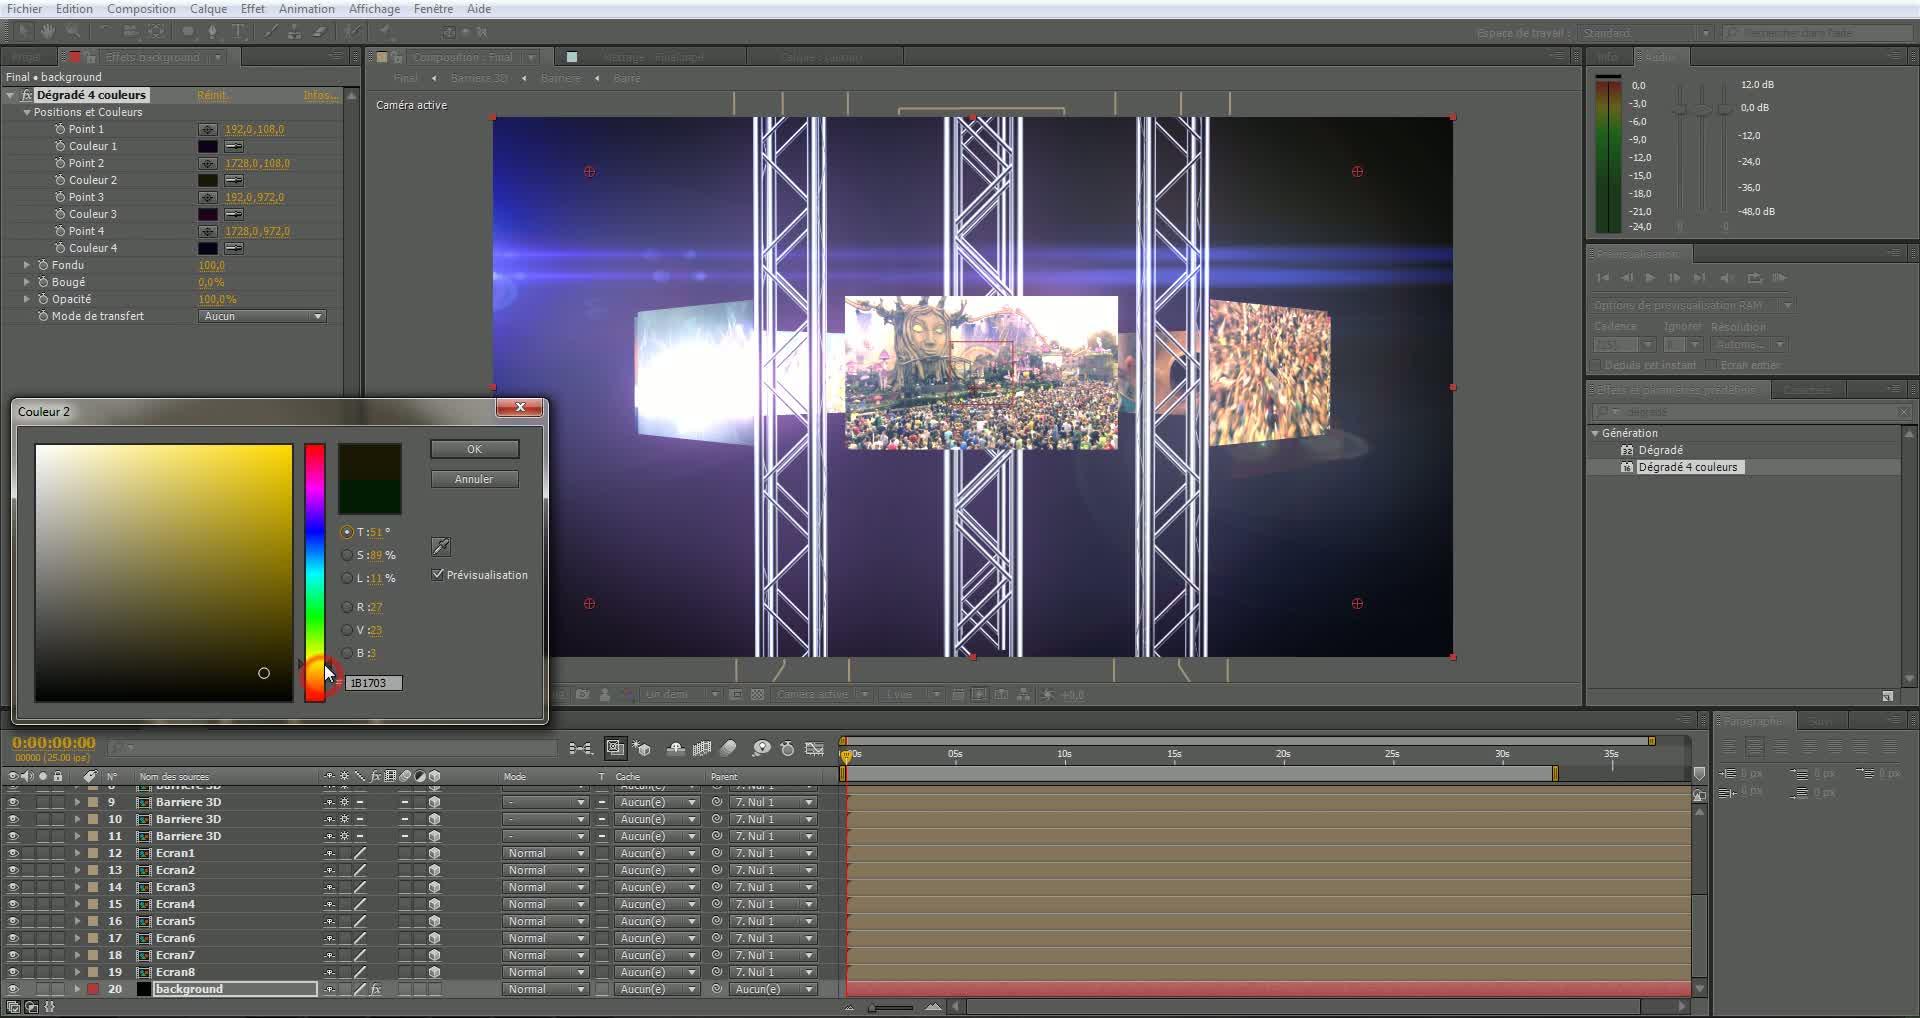 Cinema 4D Tutorial: AE To C4D Maxon Plugin - The Pixel Lab